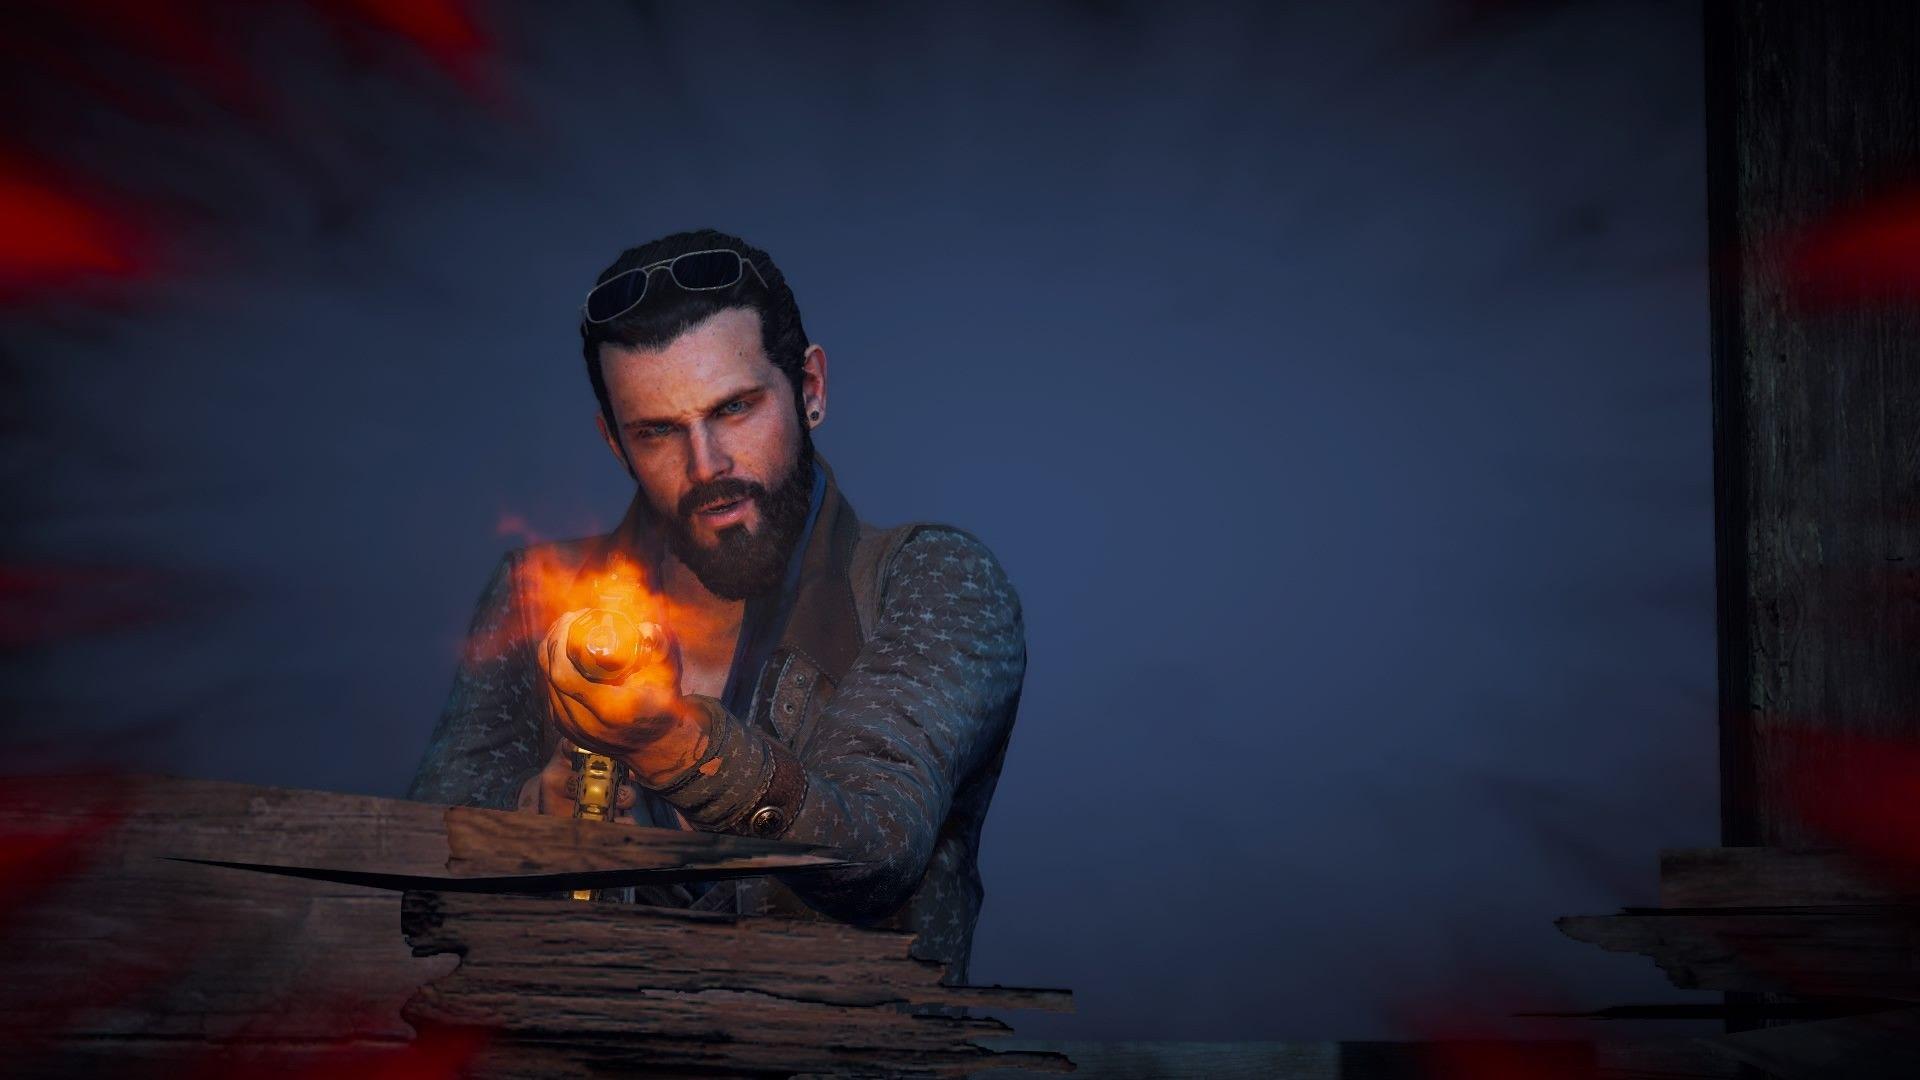 Far Cry 5 Joseph Seed Fanart New Dawn John Seed Jacob Faith Deputy Gaming Far Cry 5 Battle Cry Crying